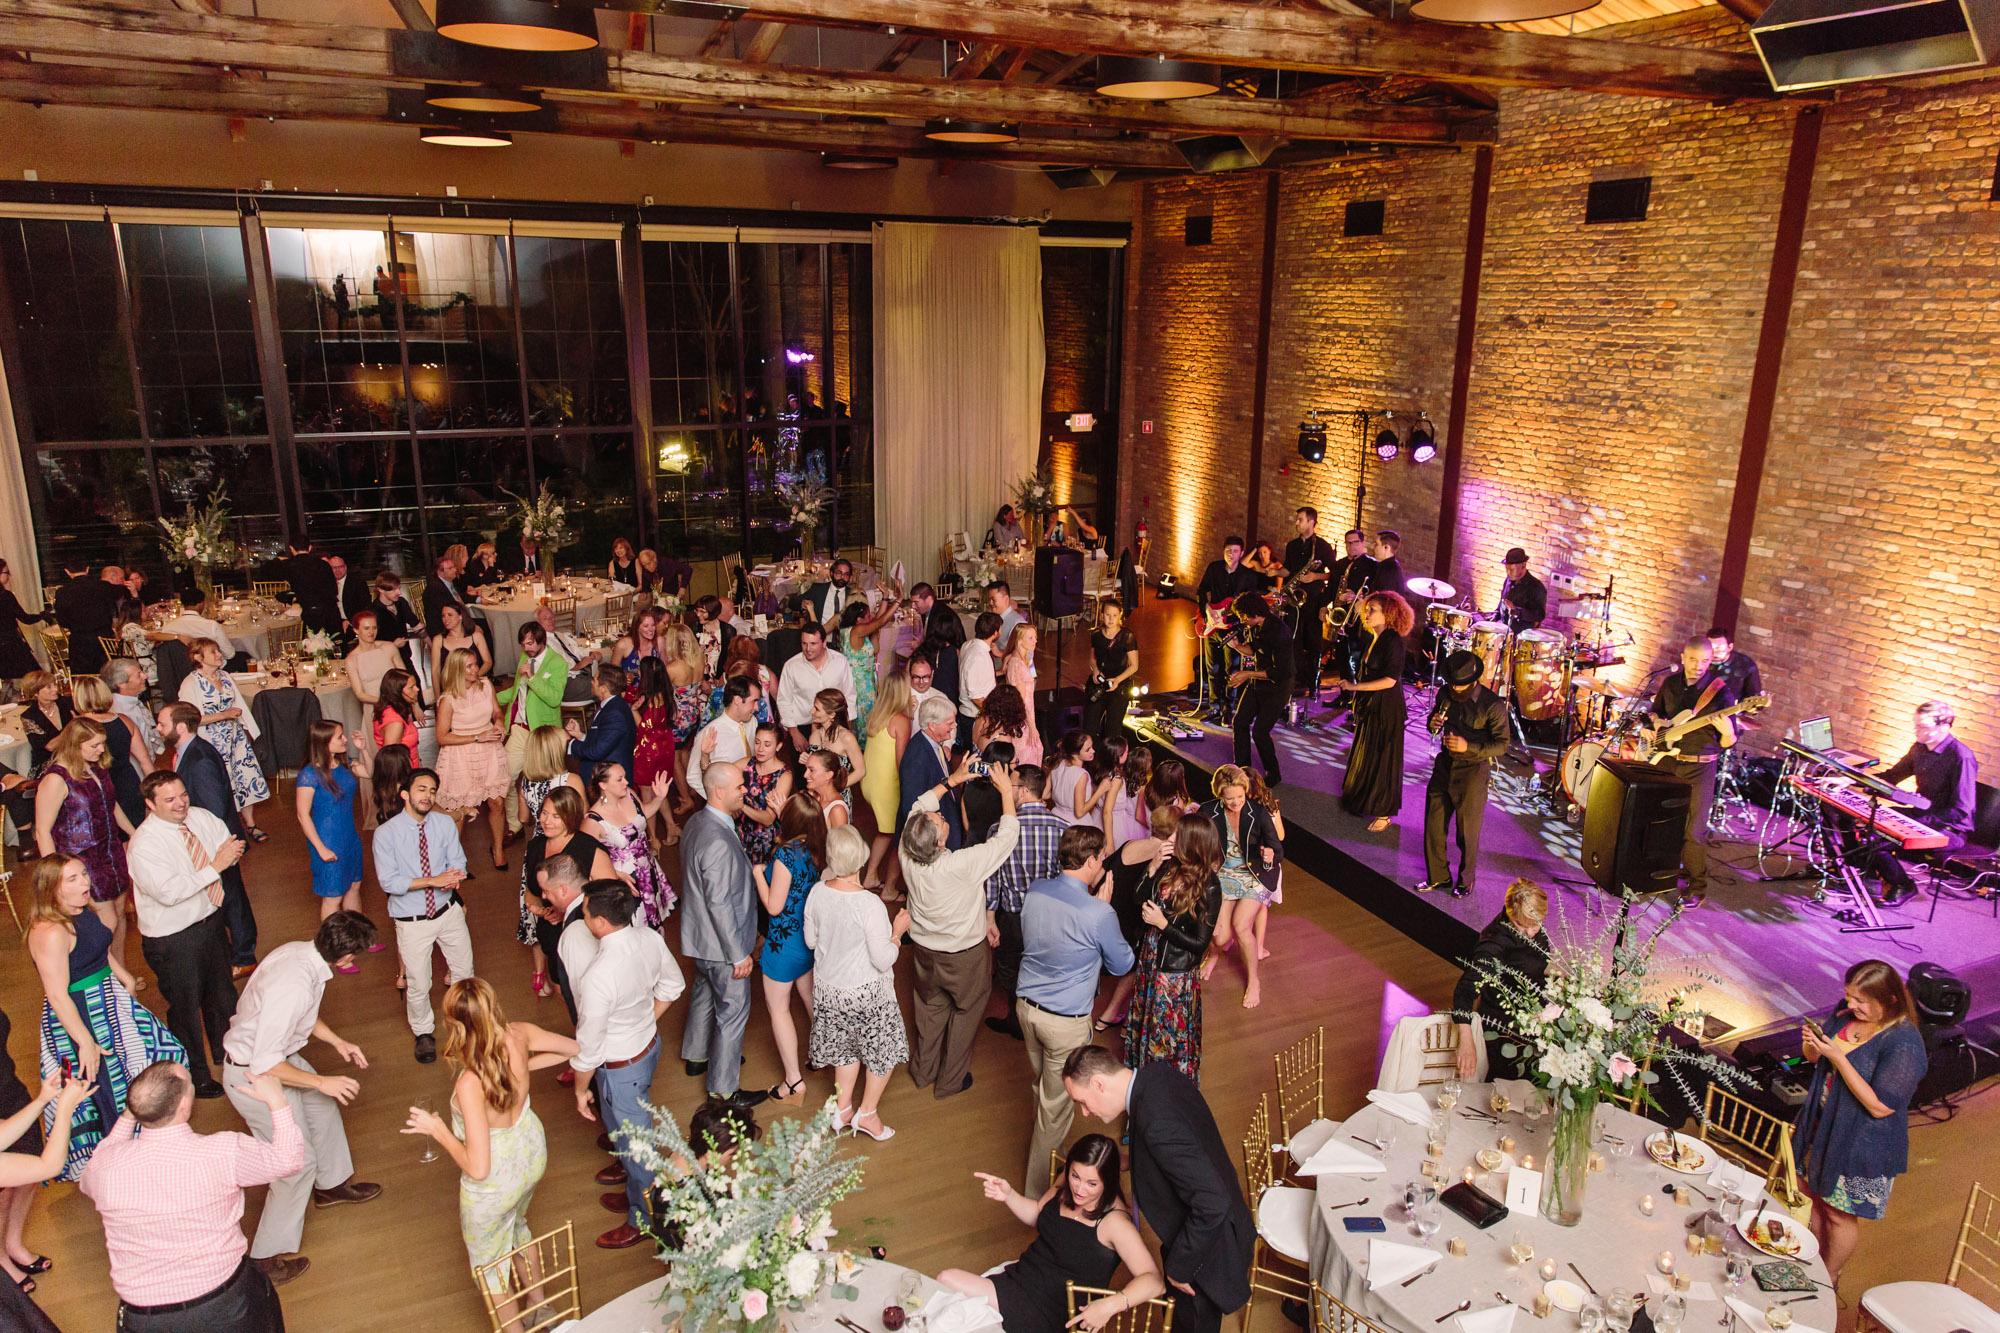 79_Rowan_Brian_The_Roundhouse_Wedding_Beacon_NY_Tanya_Salazar_Photography_900.jpg